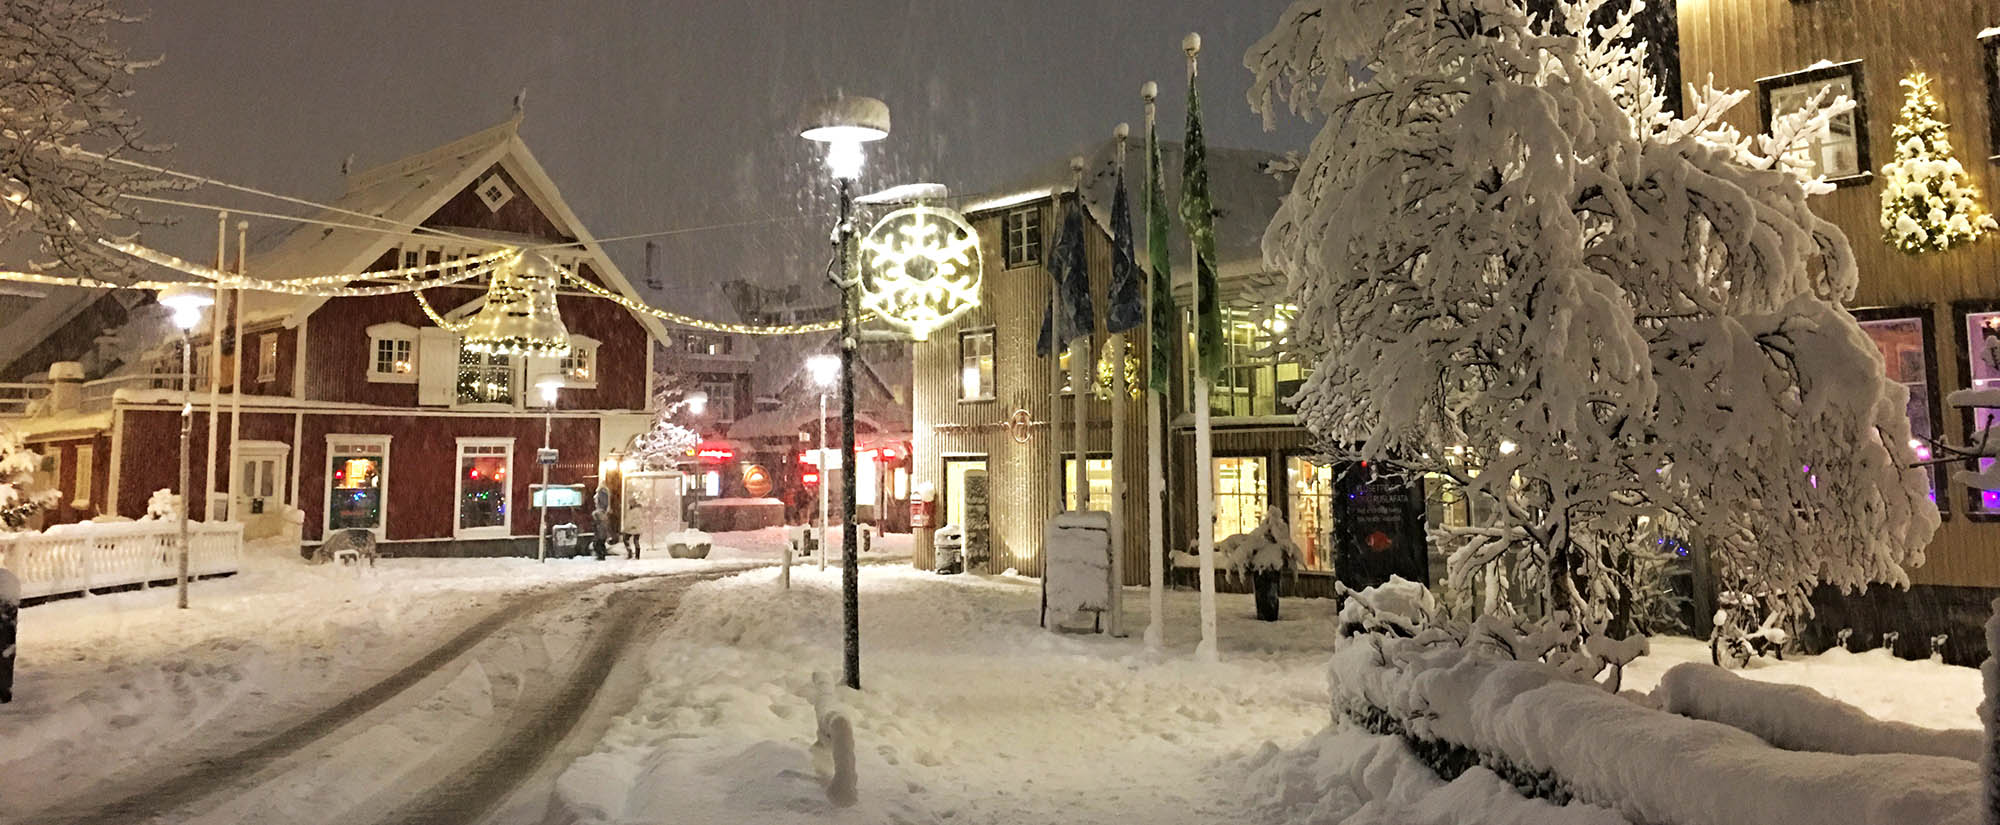 Christmas in Reykjavik